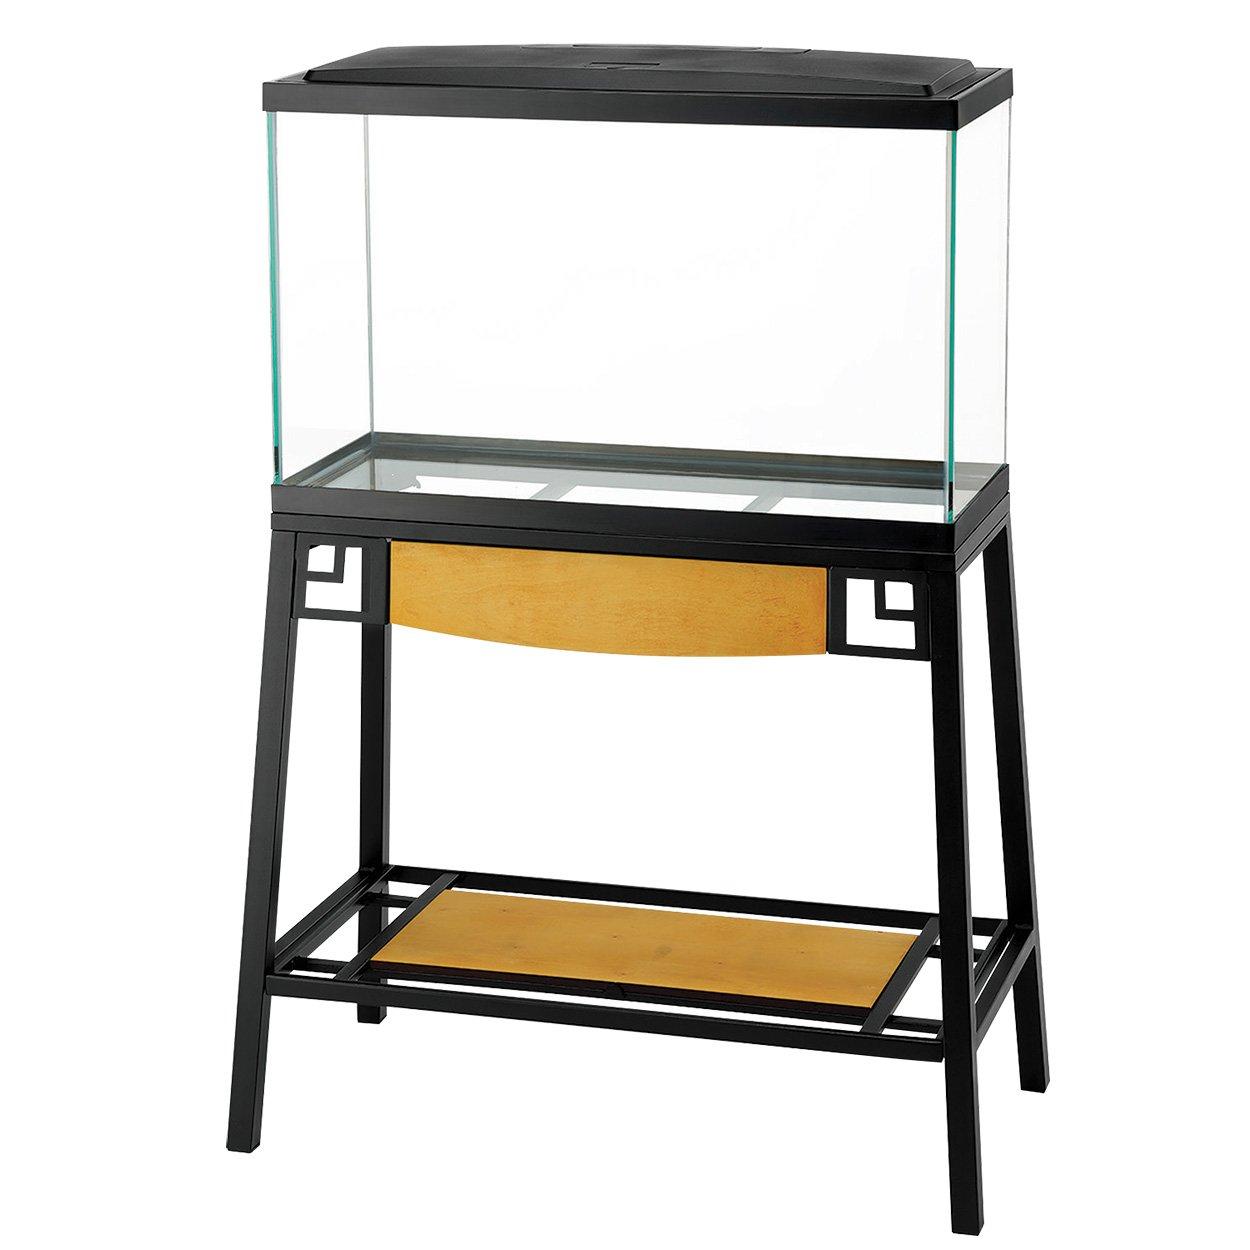 Amazon Com Aqueon Forge Metal Aquarium Stand 30 By 12 Inch Black